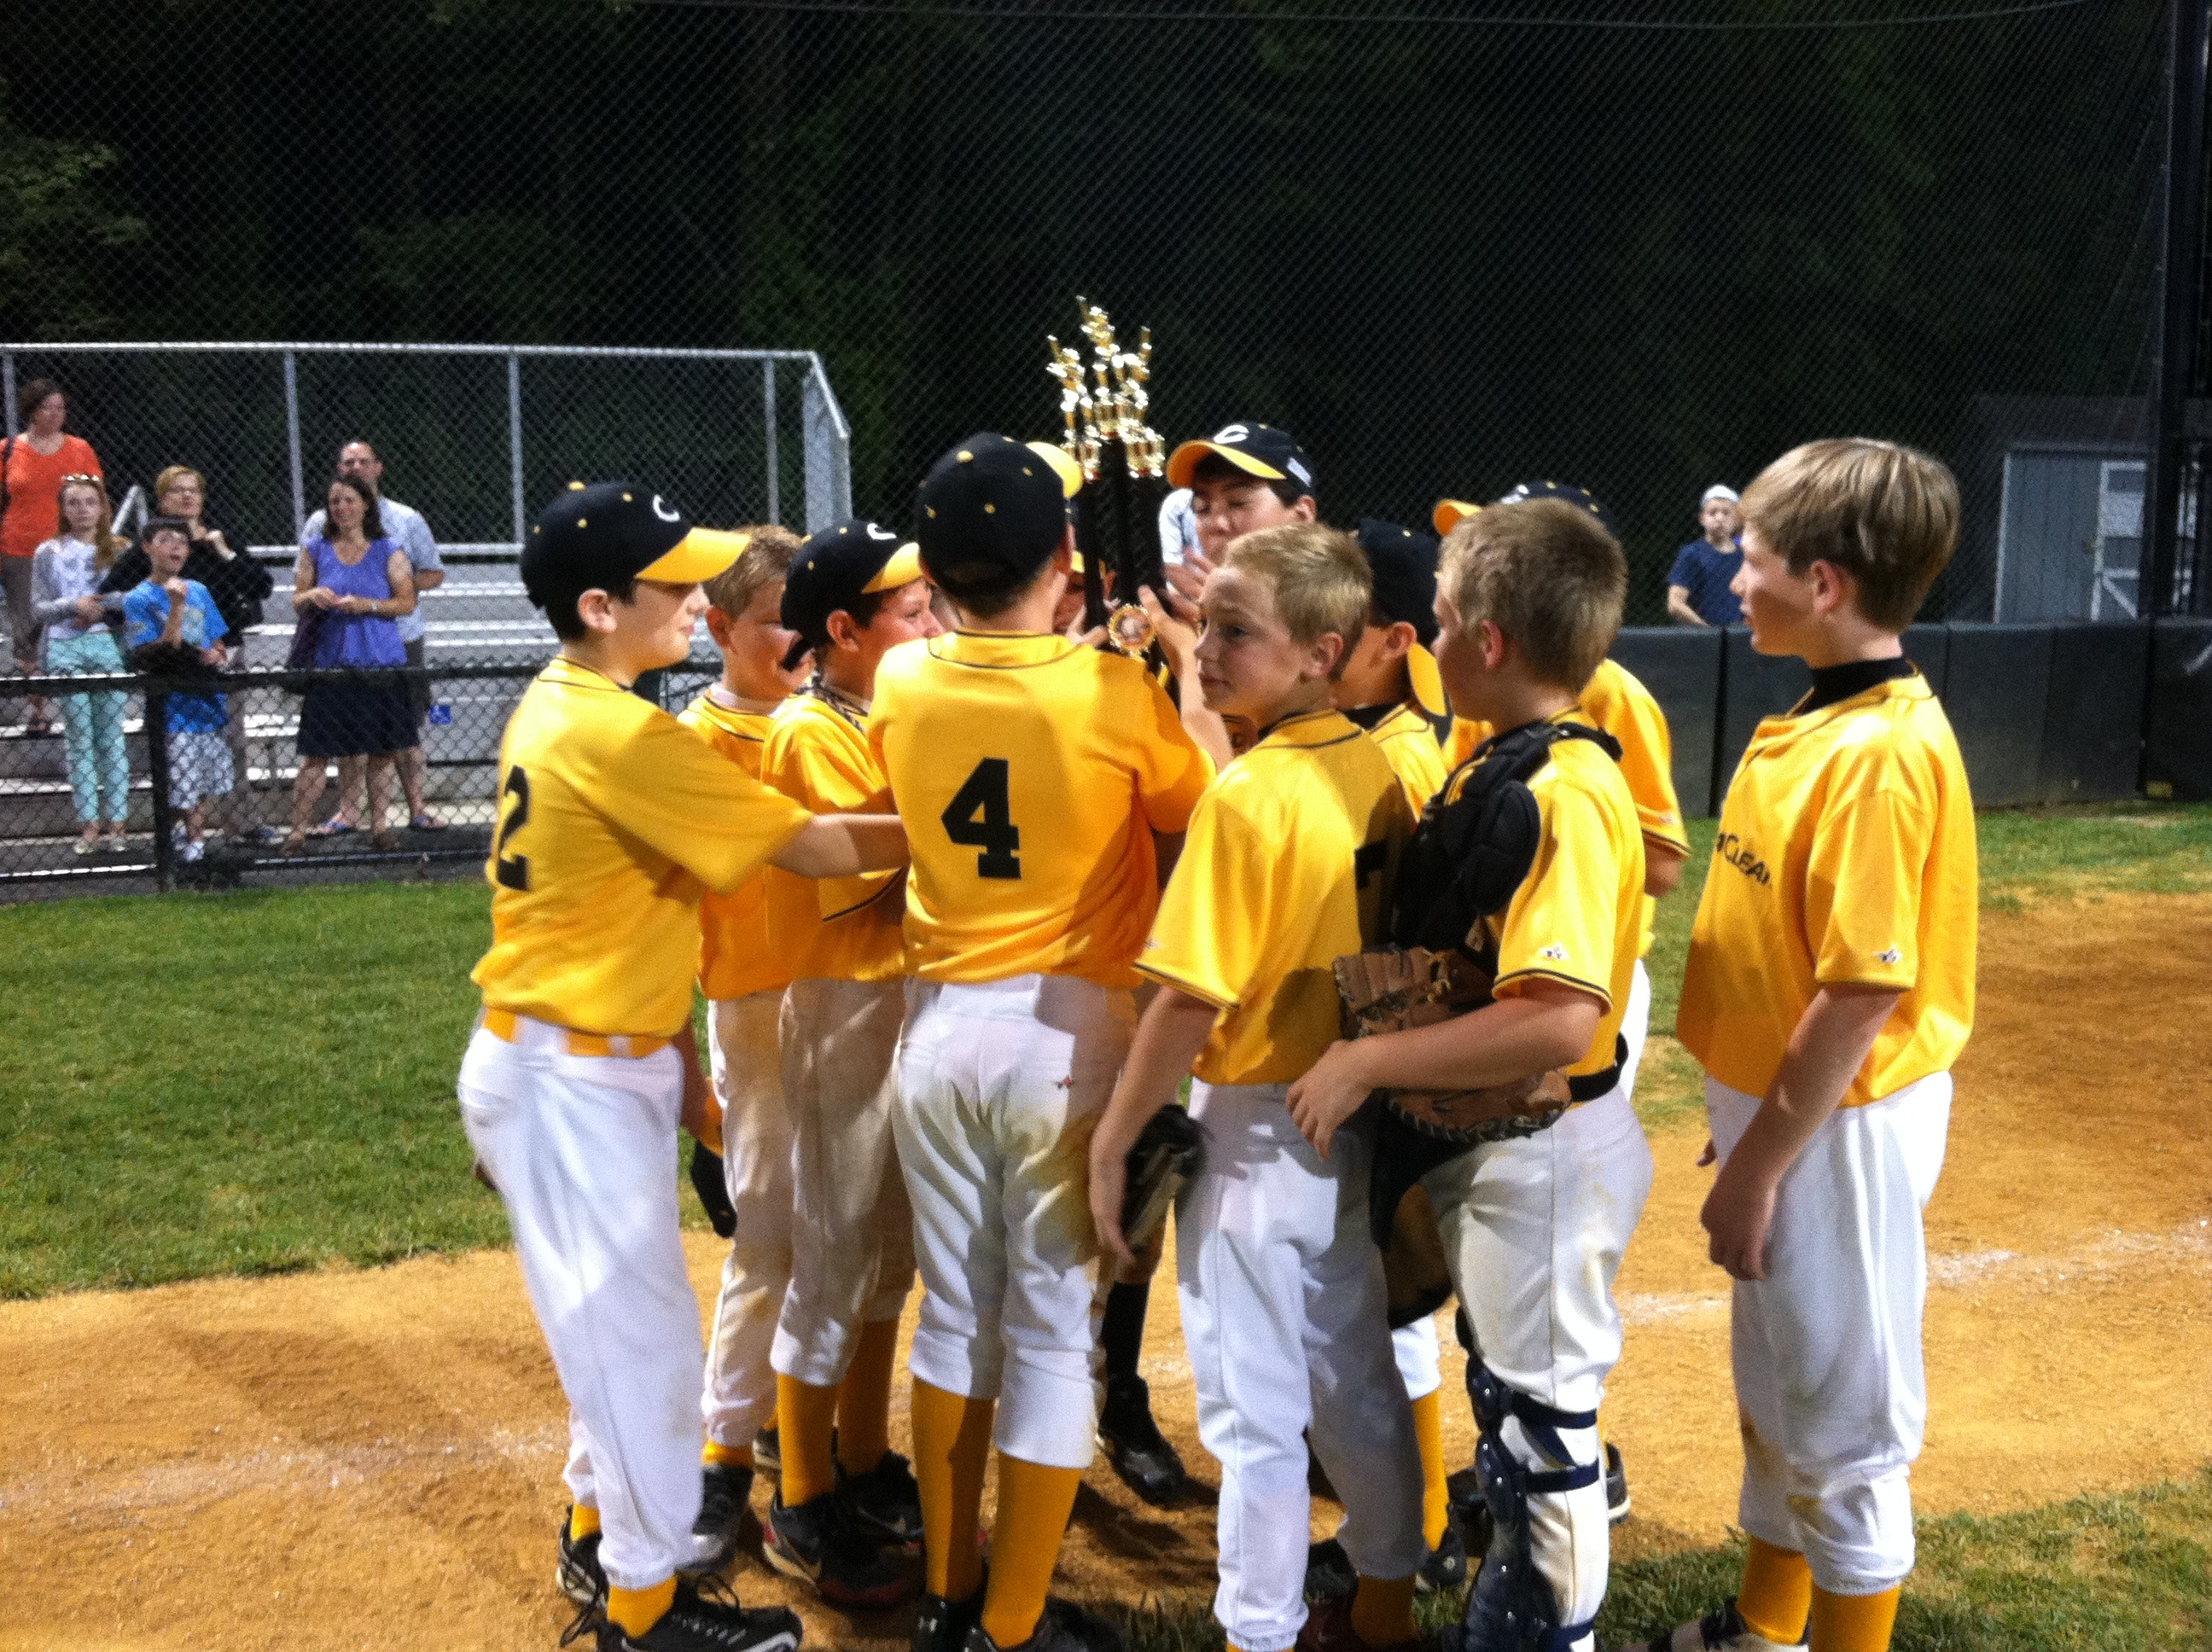 Chatham and Madison Team Up to Host Baseball Championship